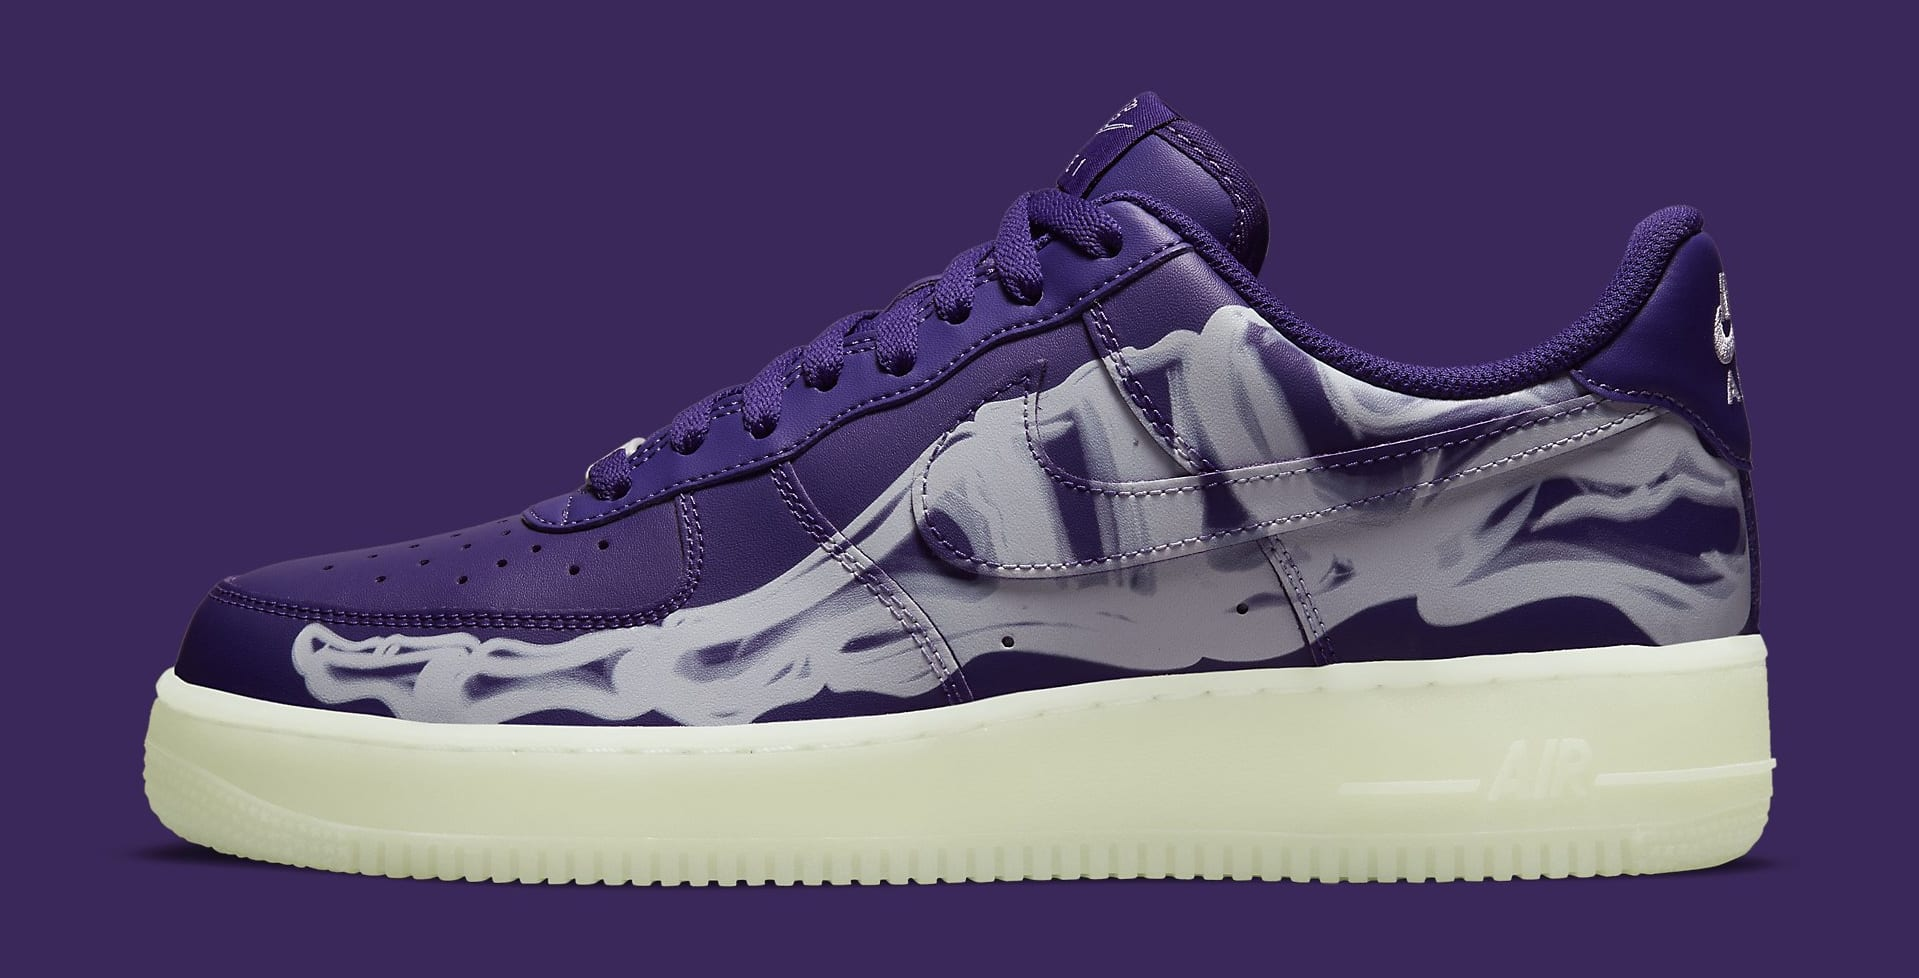 Nike Air Force 1 Low 'Purple Skeleton' CU8067-500 Lateral